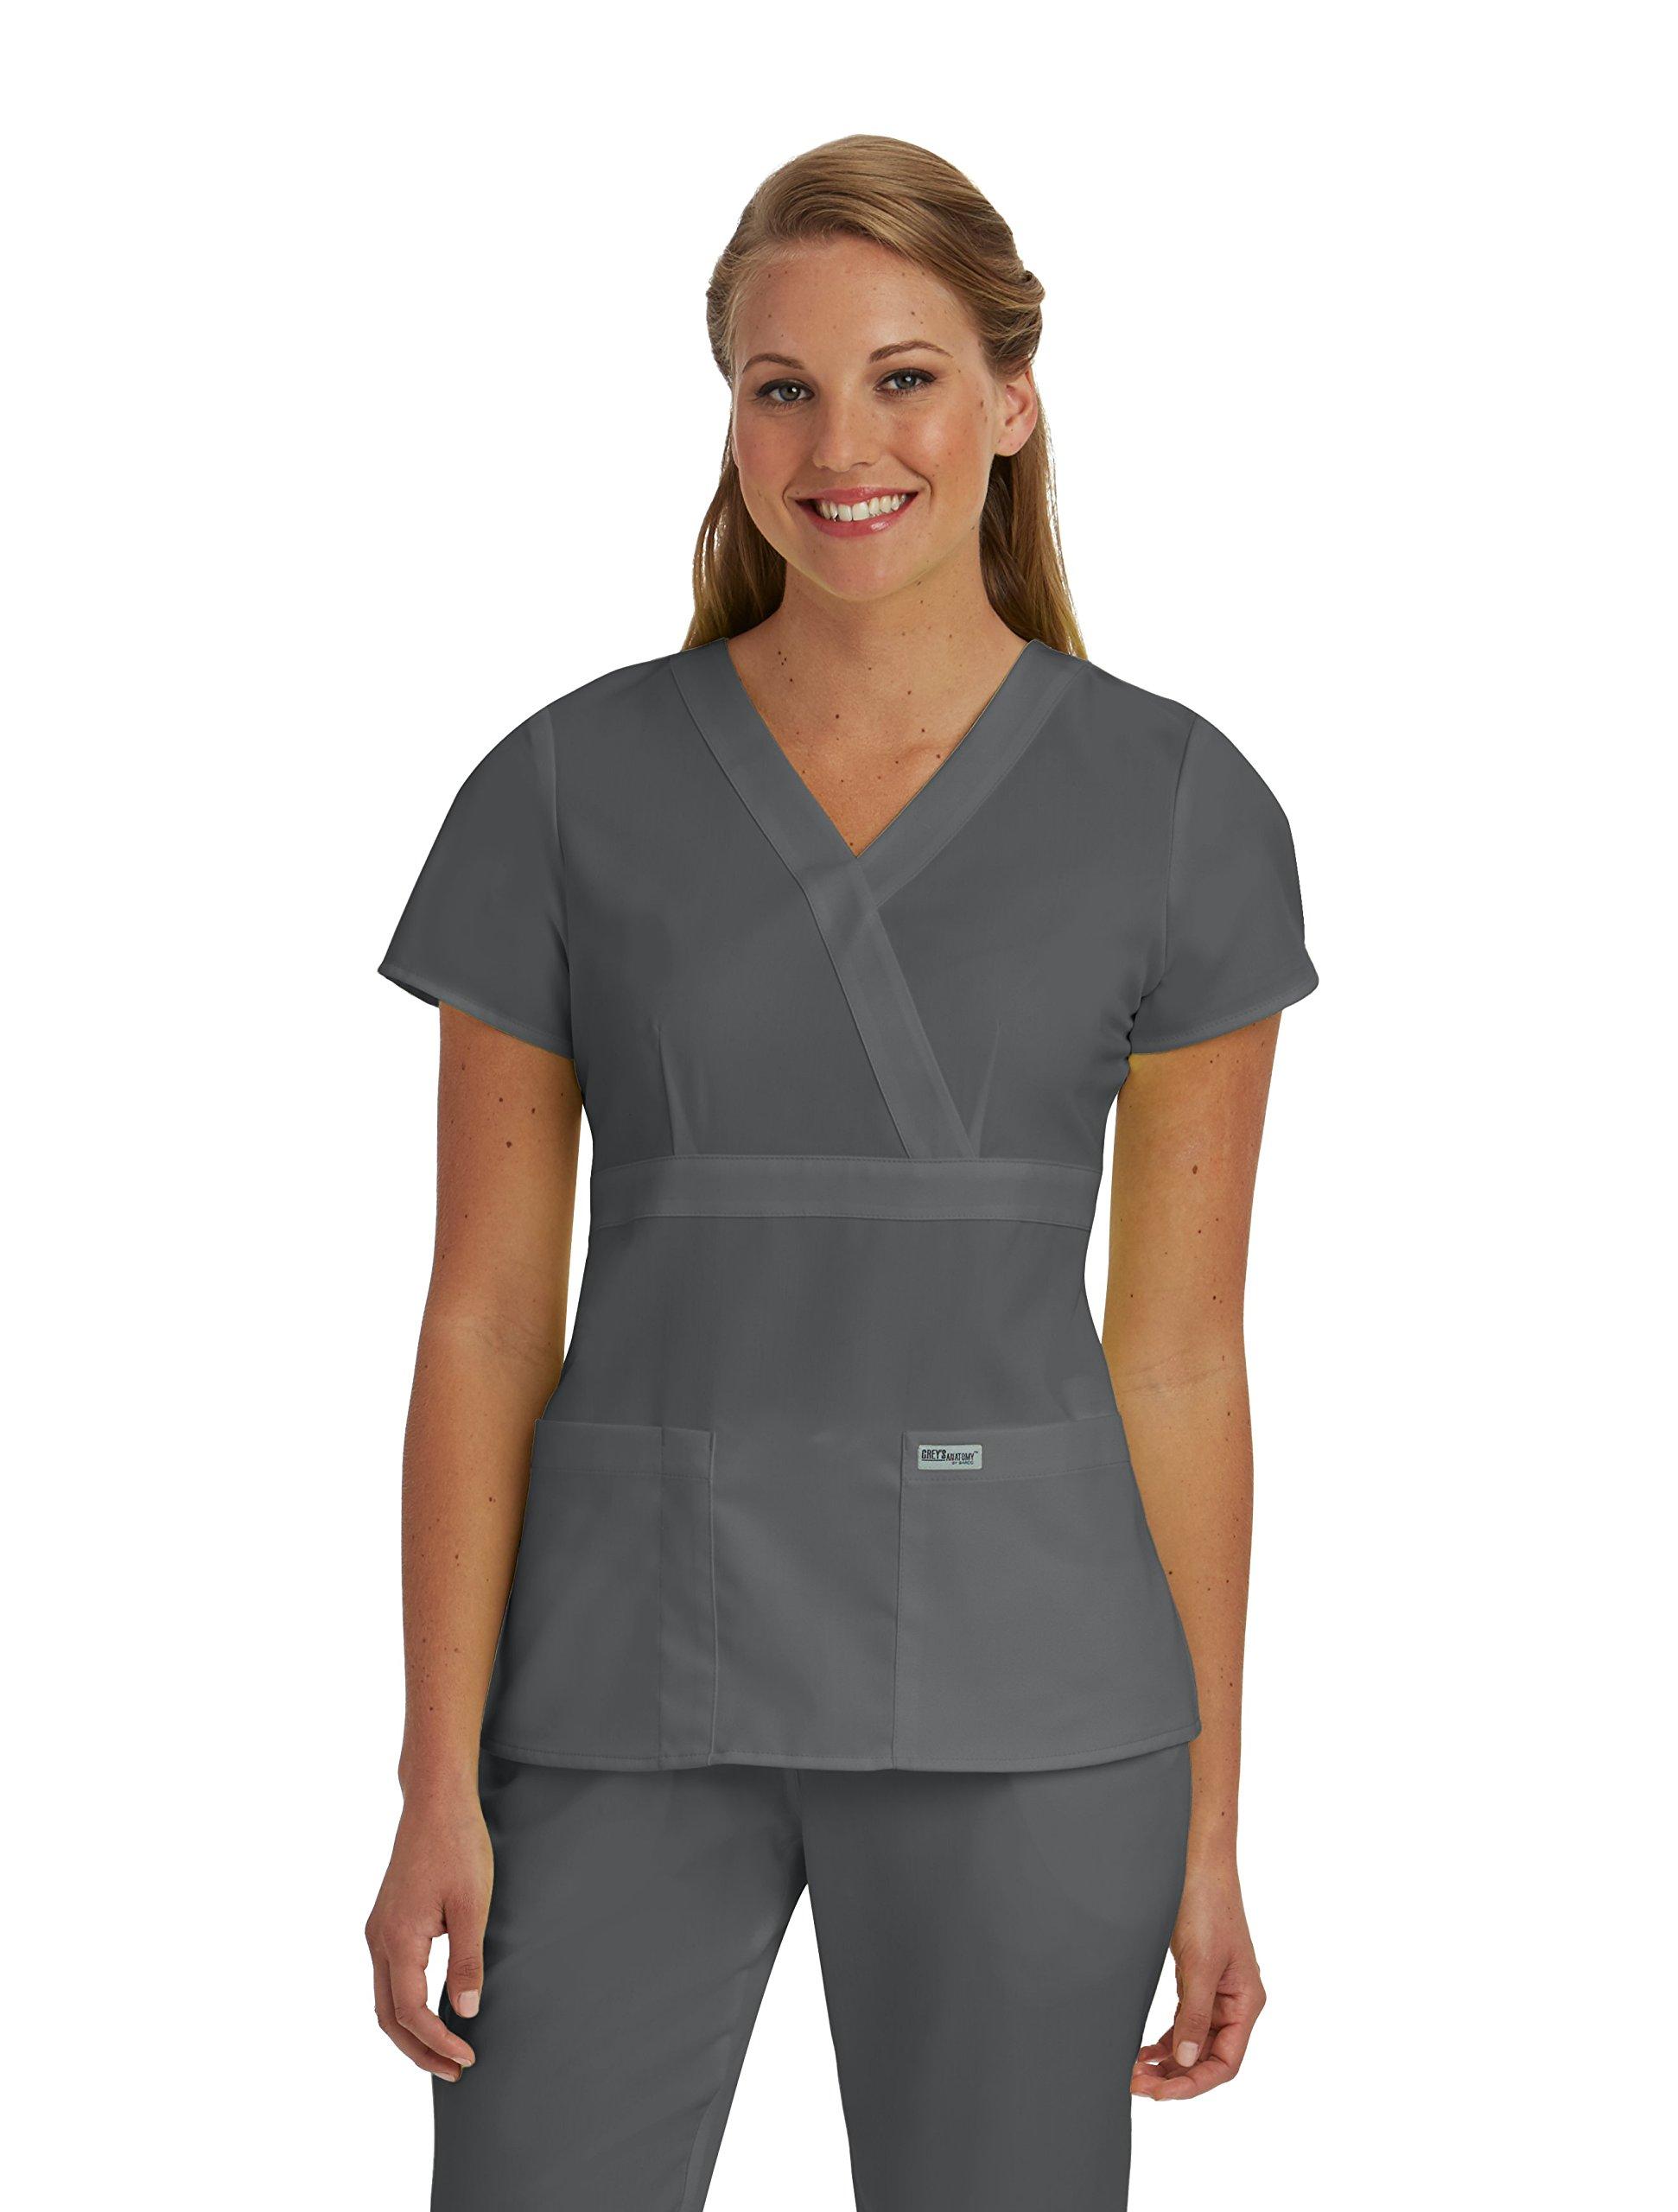 Grey's Anatomy 4153 Top (Pewter, 2X-Large)